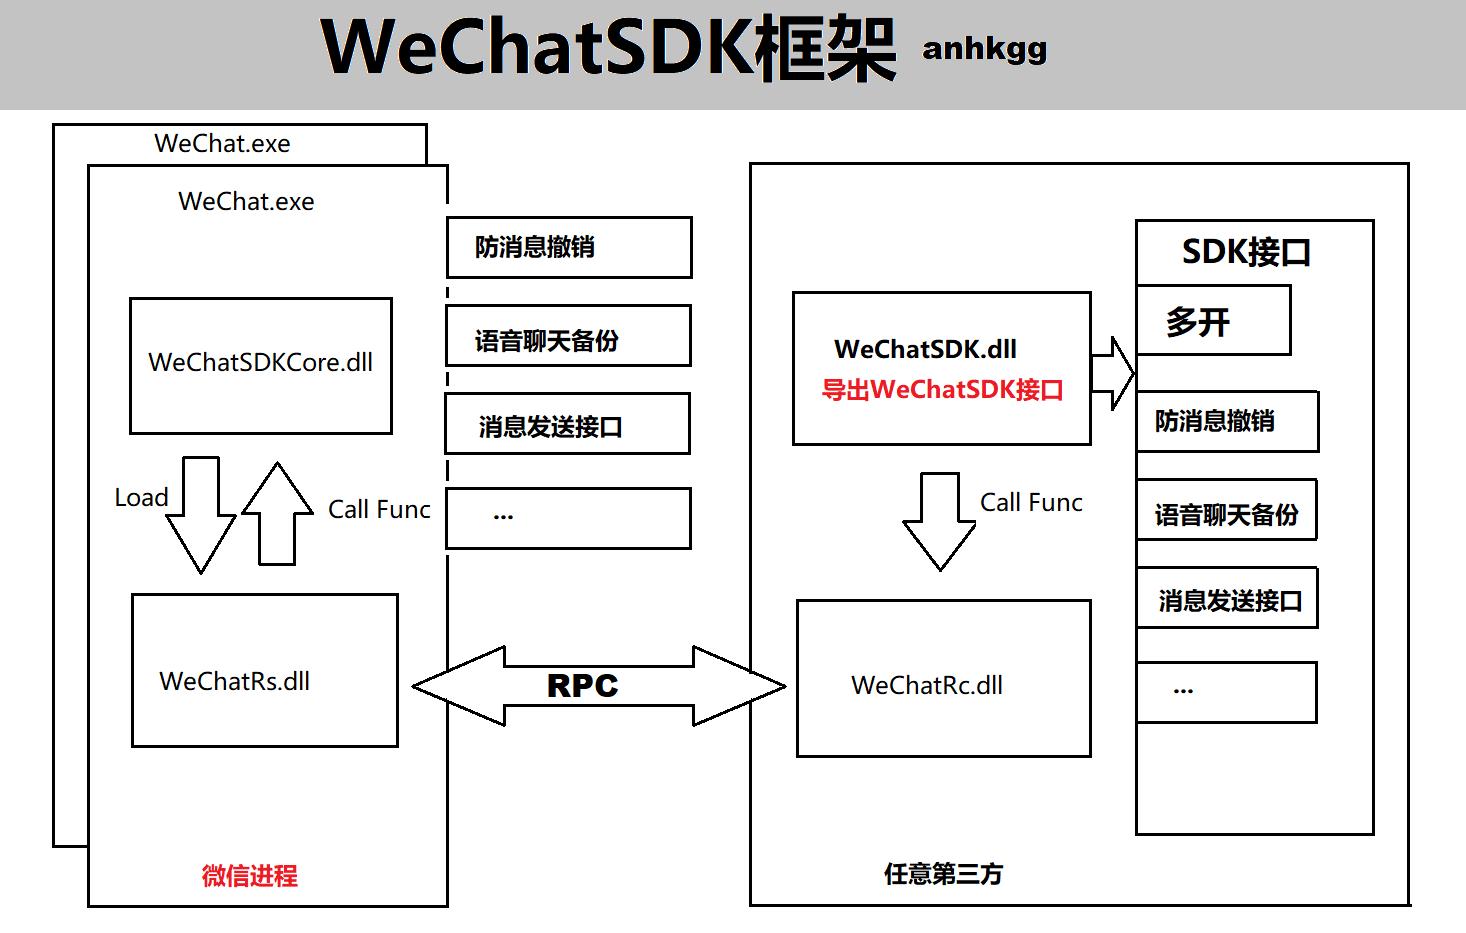 WeChatSDK 框架